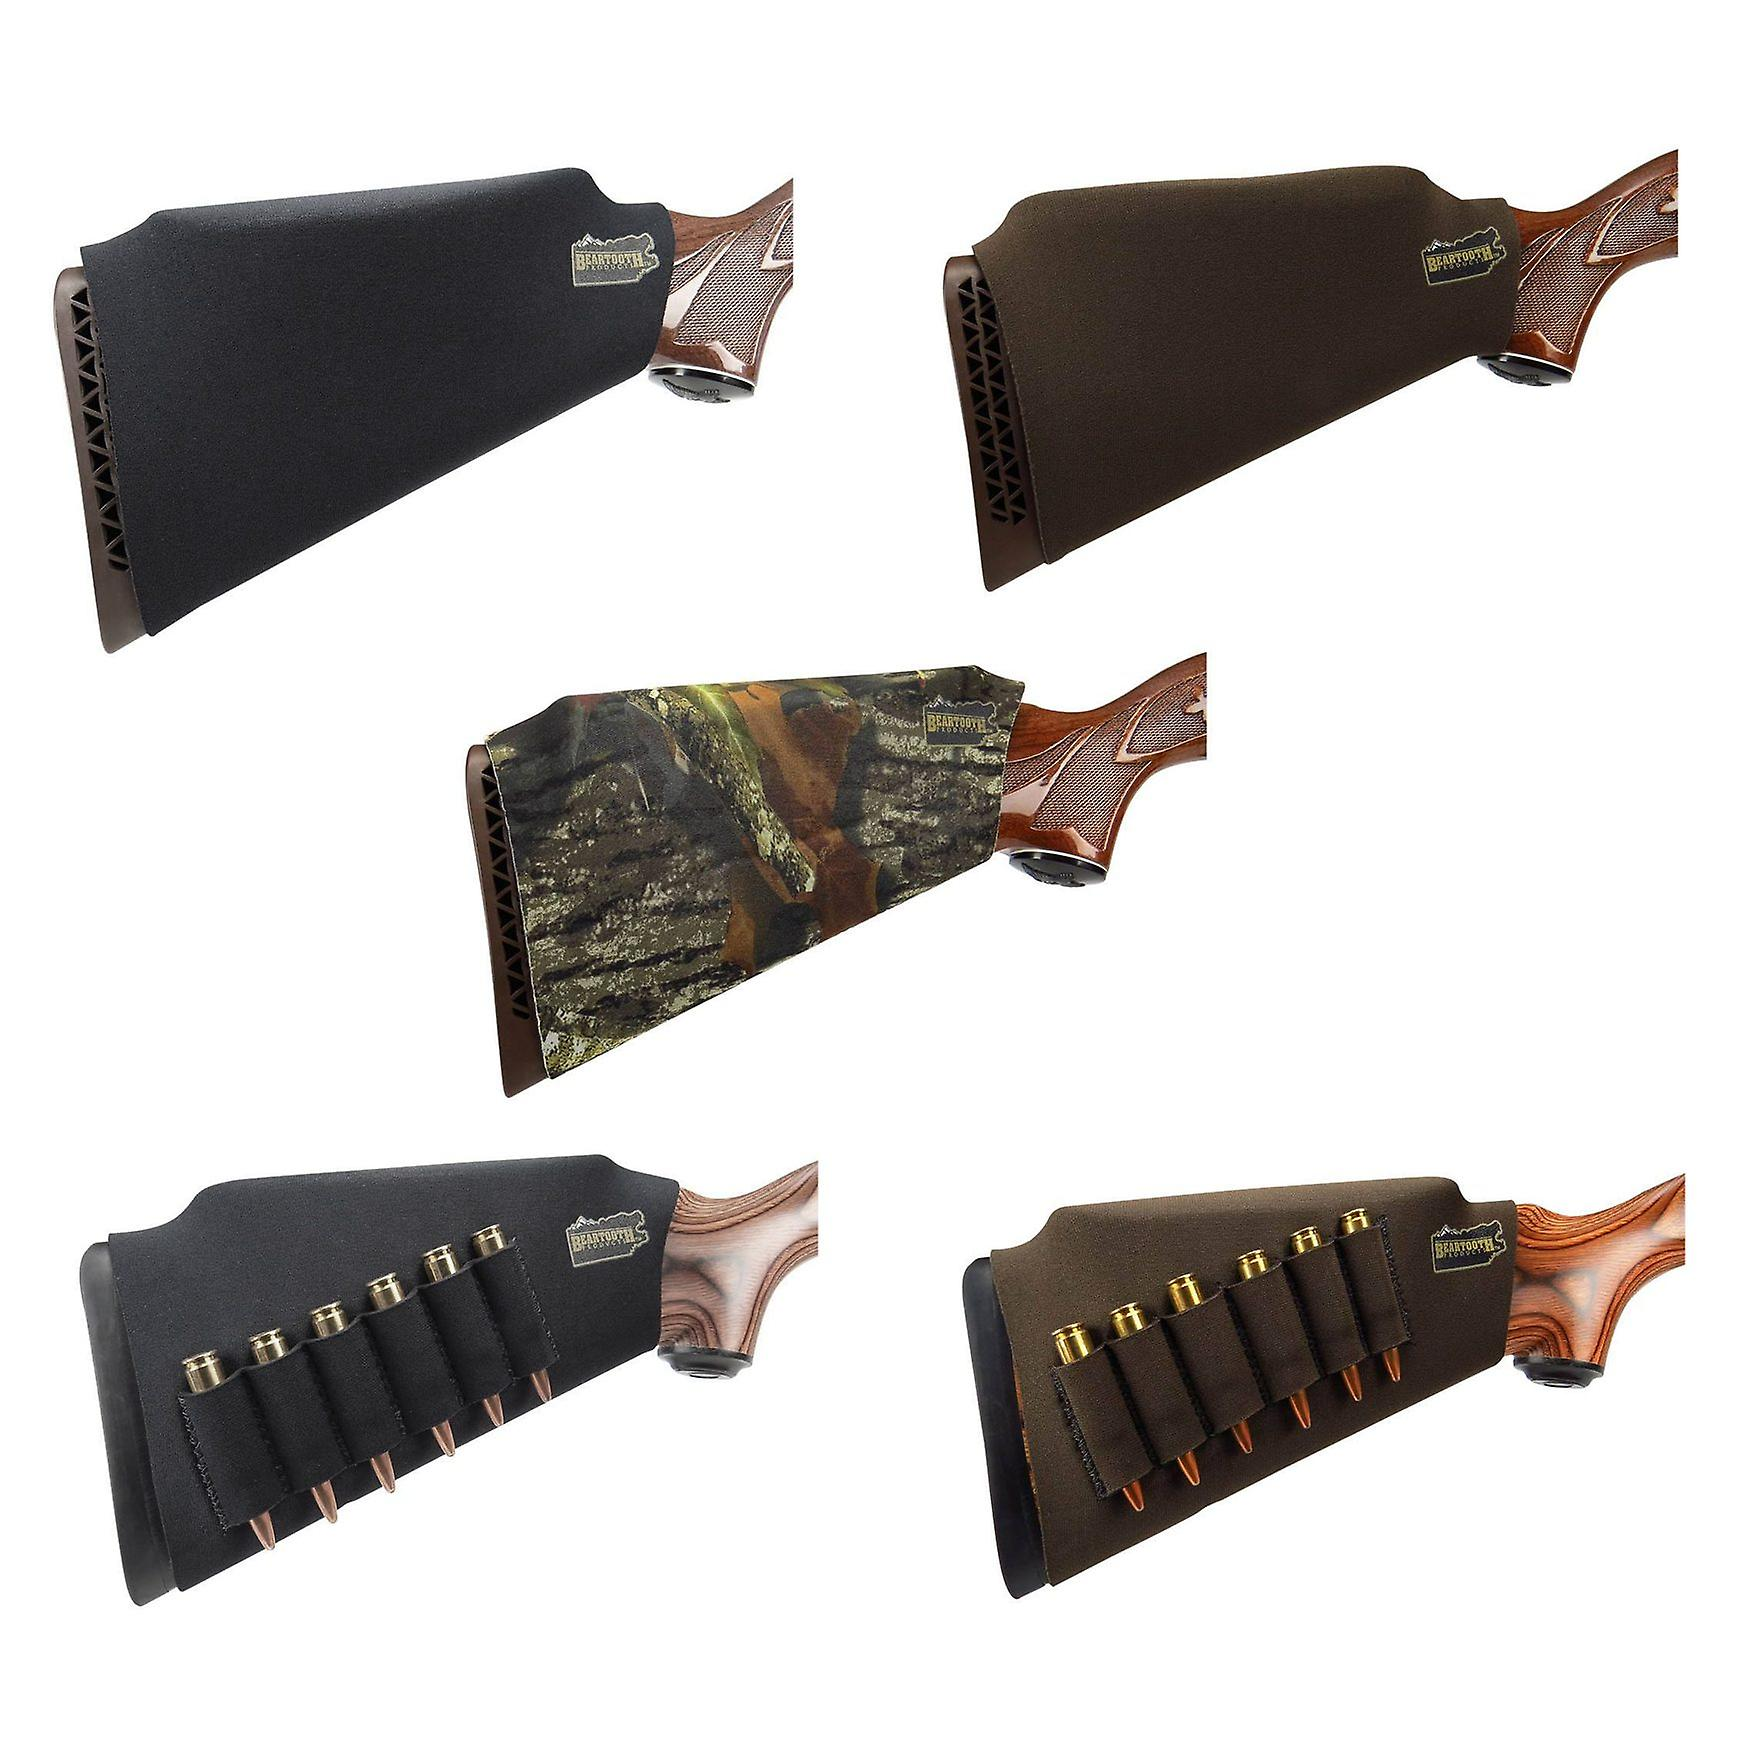 Beartooth comb raising kit - neoprene gun stock guard with inserts - shooting